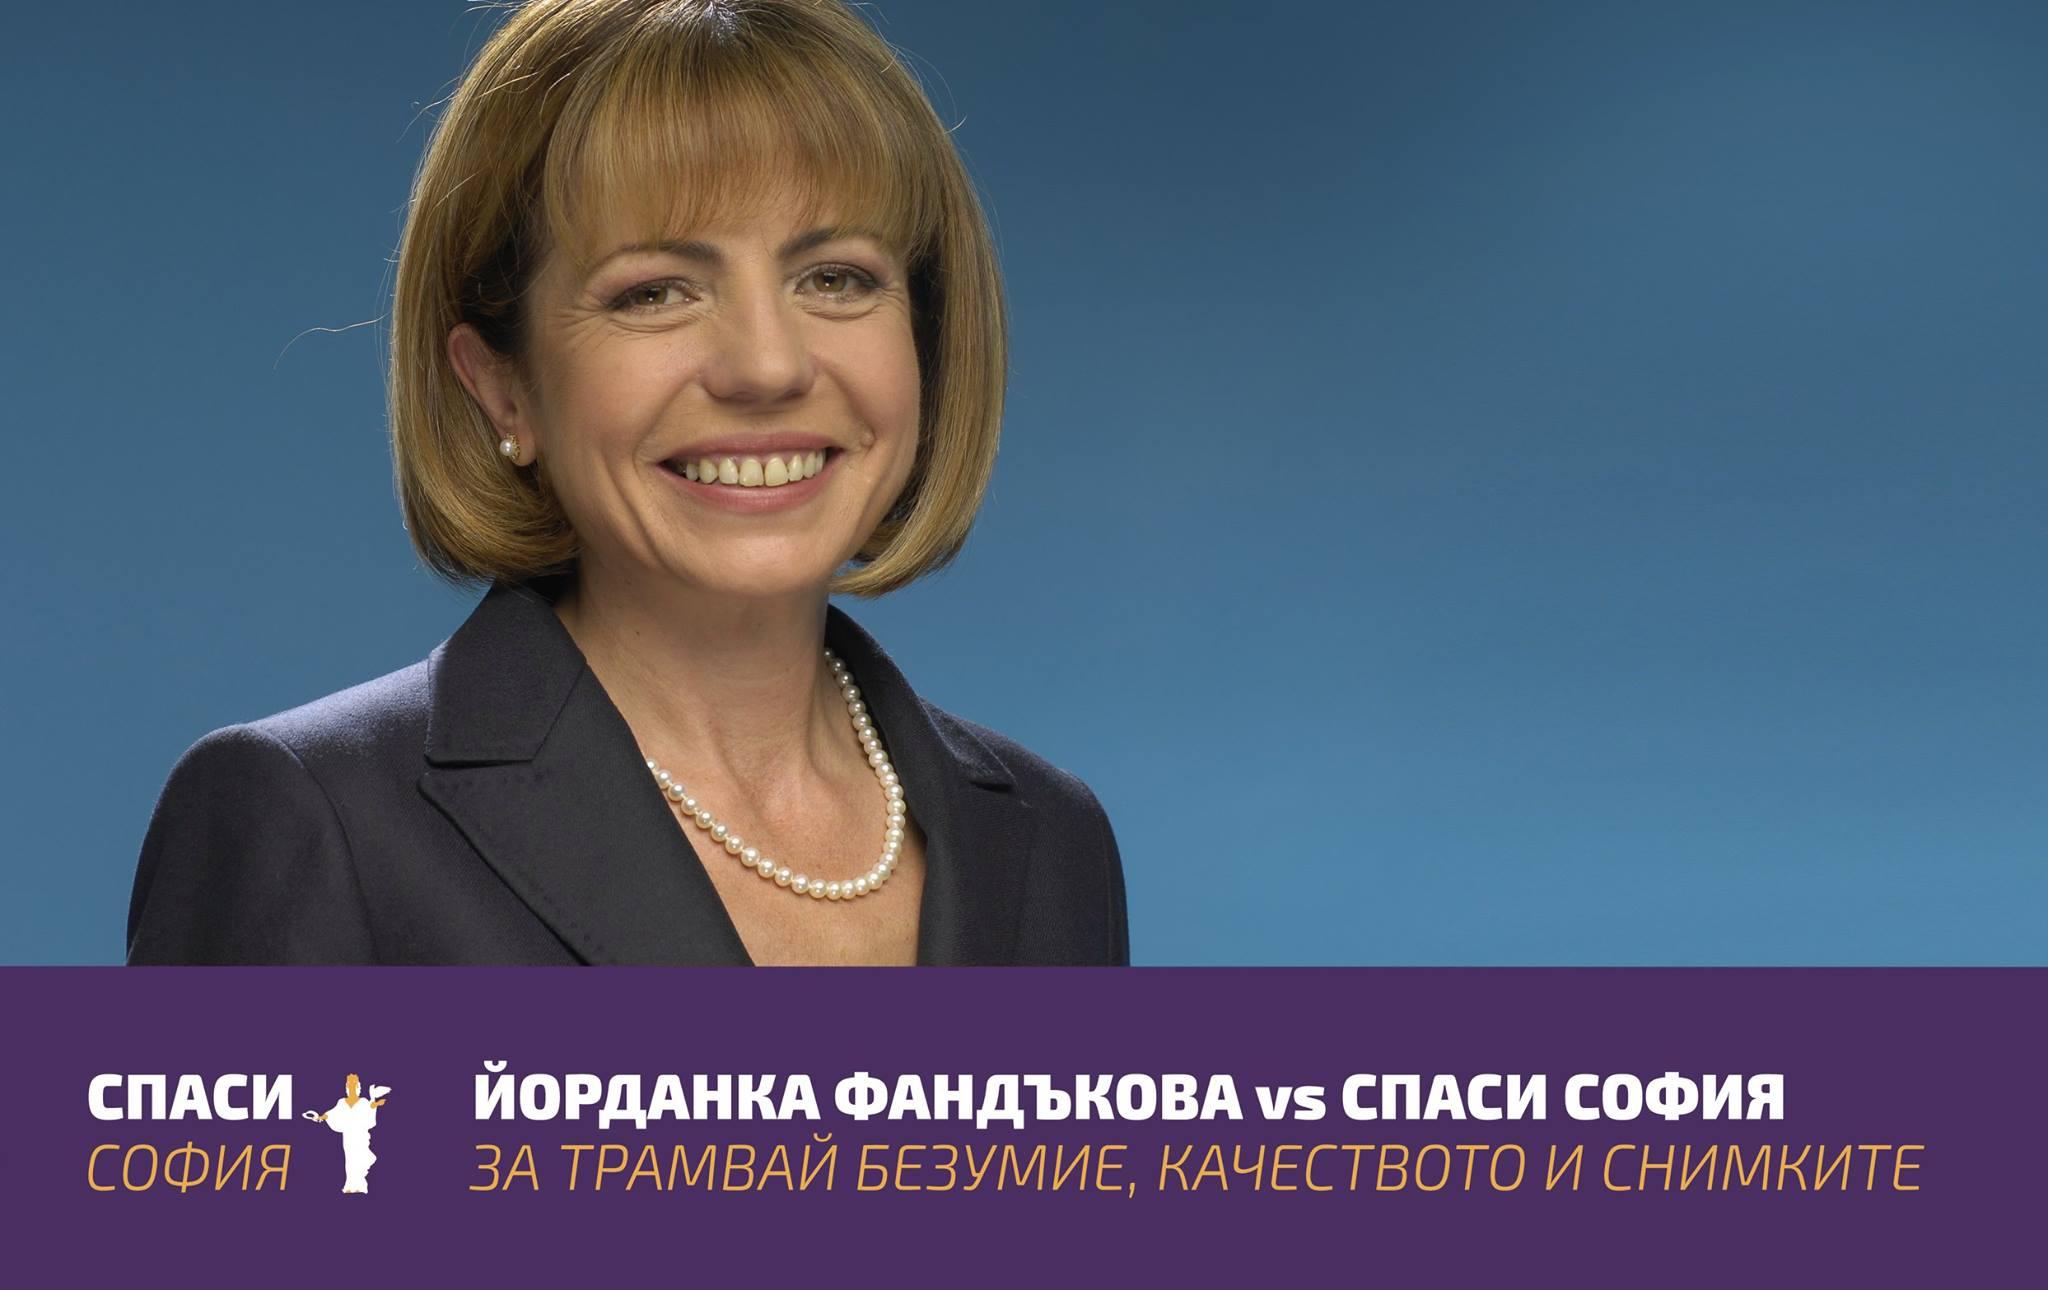 Трамвай Безумие: Фандъкова vs Спаси София